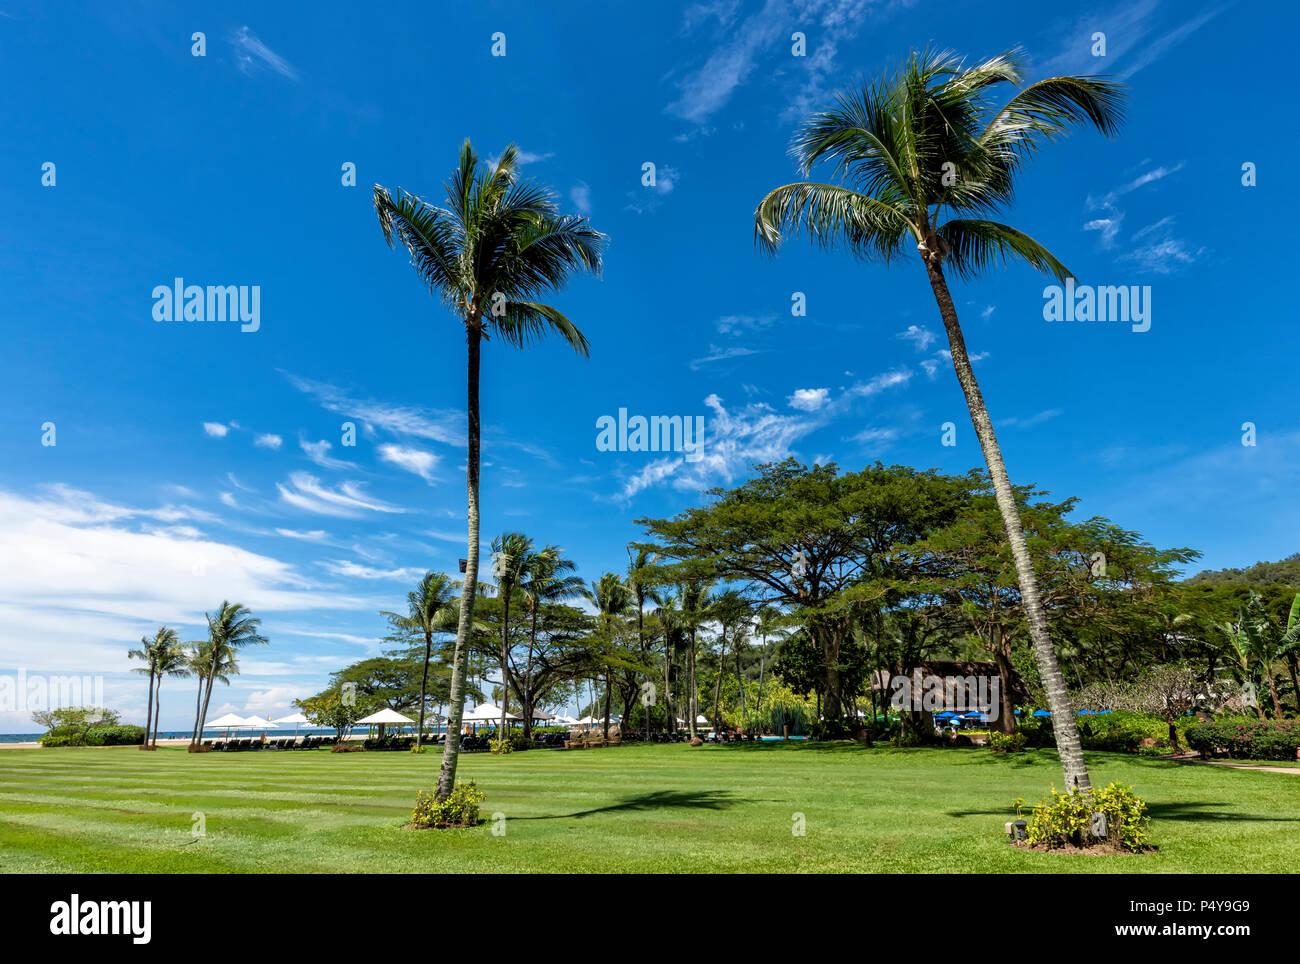 Alberi di Palma contro un cielo blu in Kota Kinabalu sul Borneo, Malaysia Immagini Stock